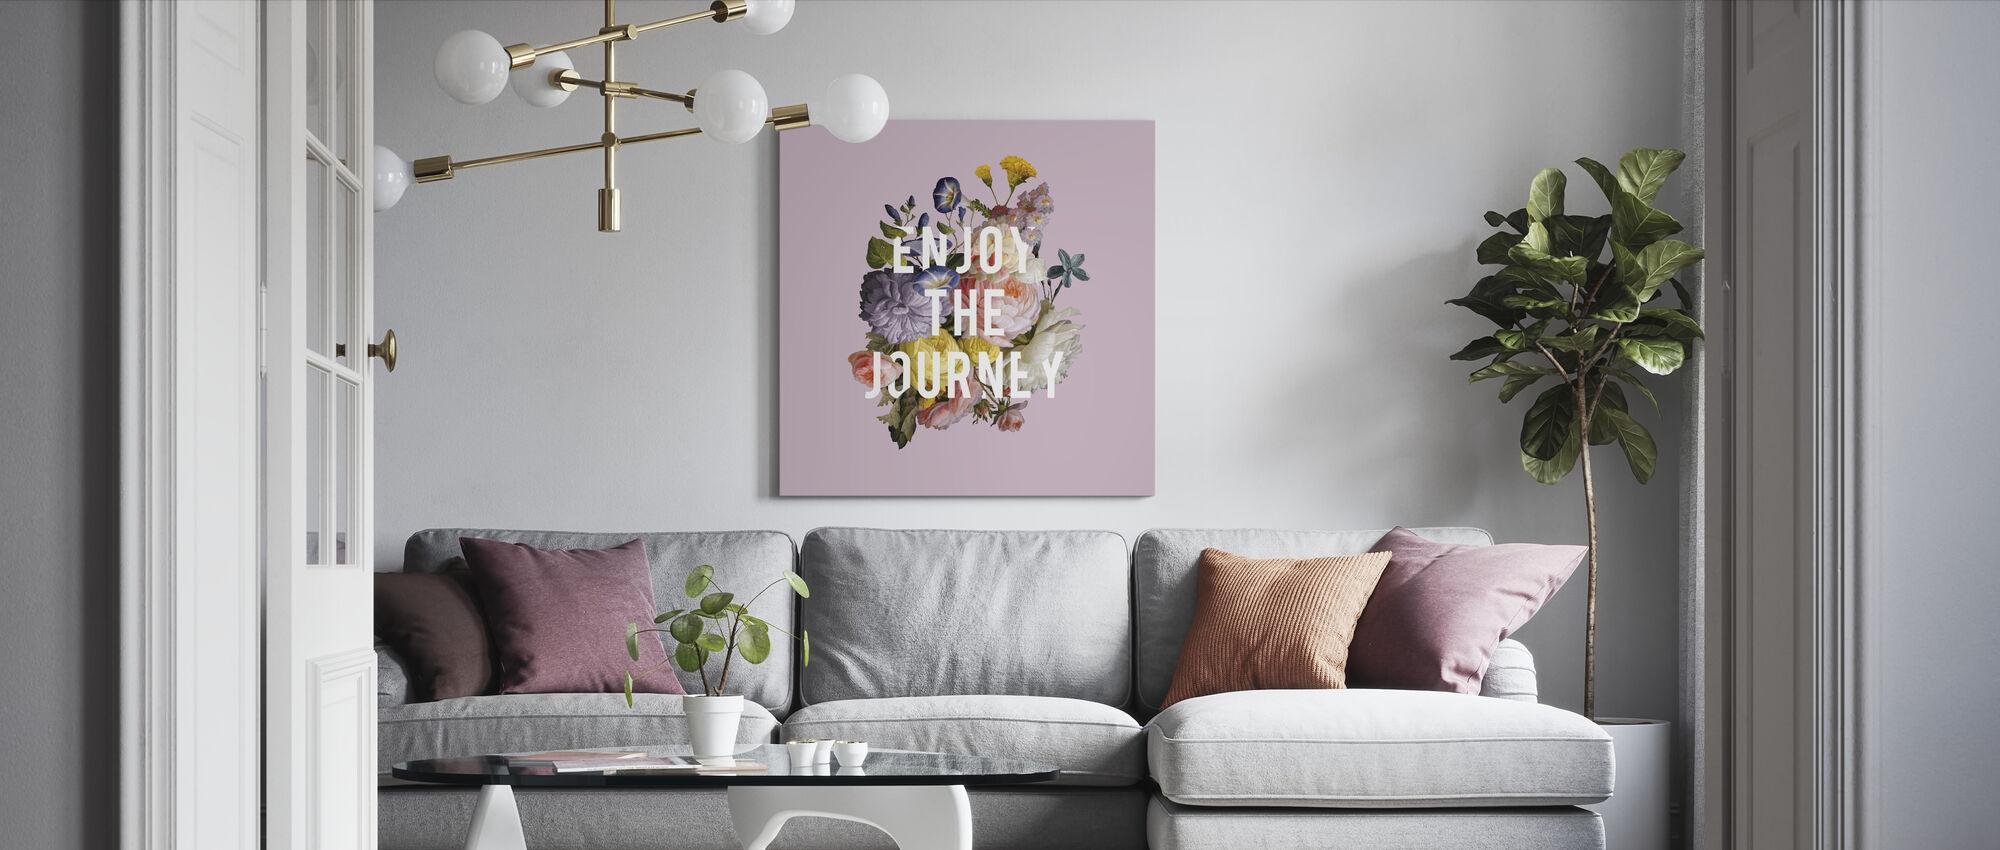 Floral Sentiment II - Canvas print - Living Room